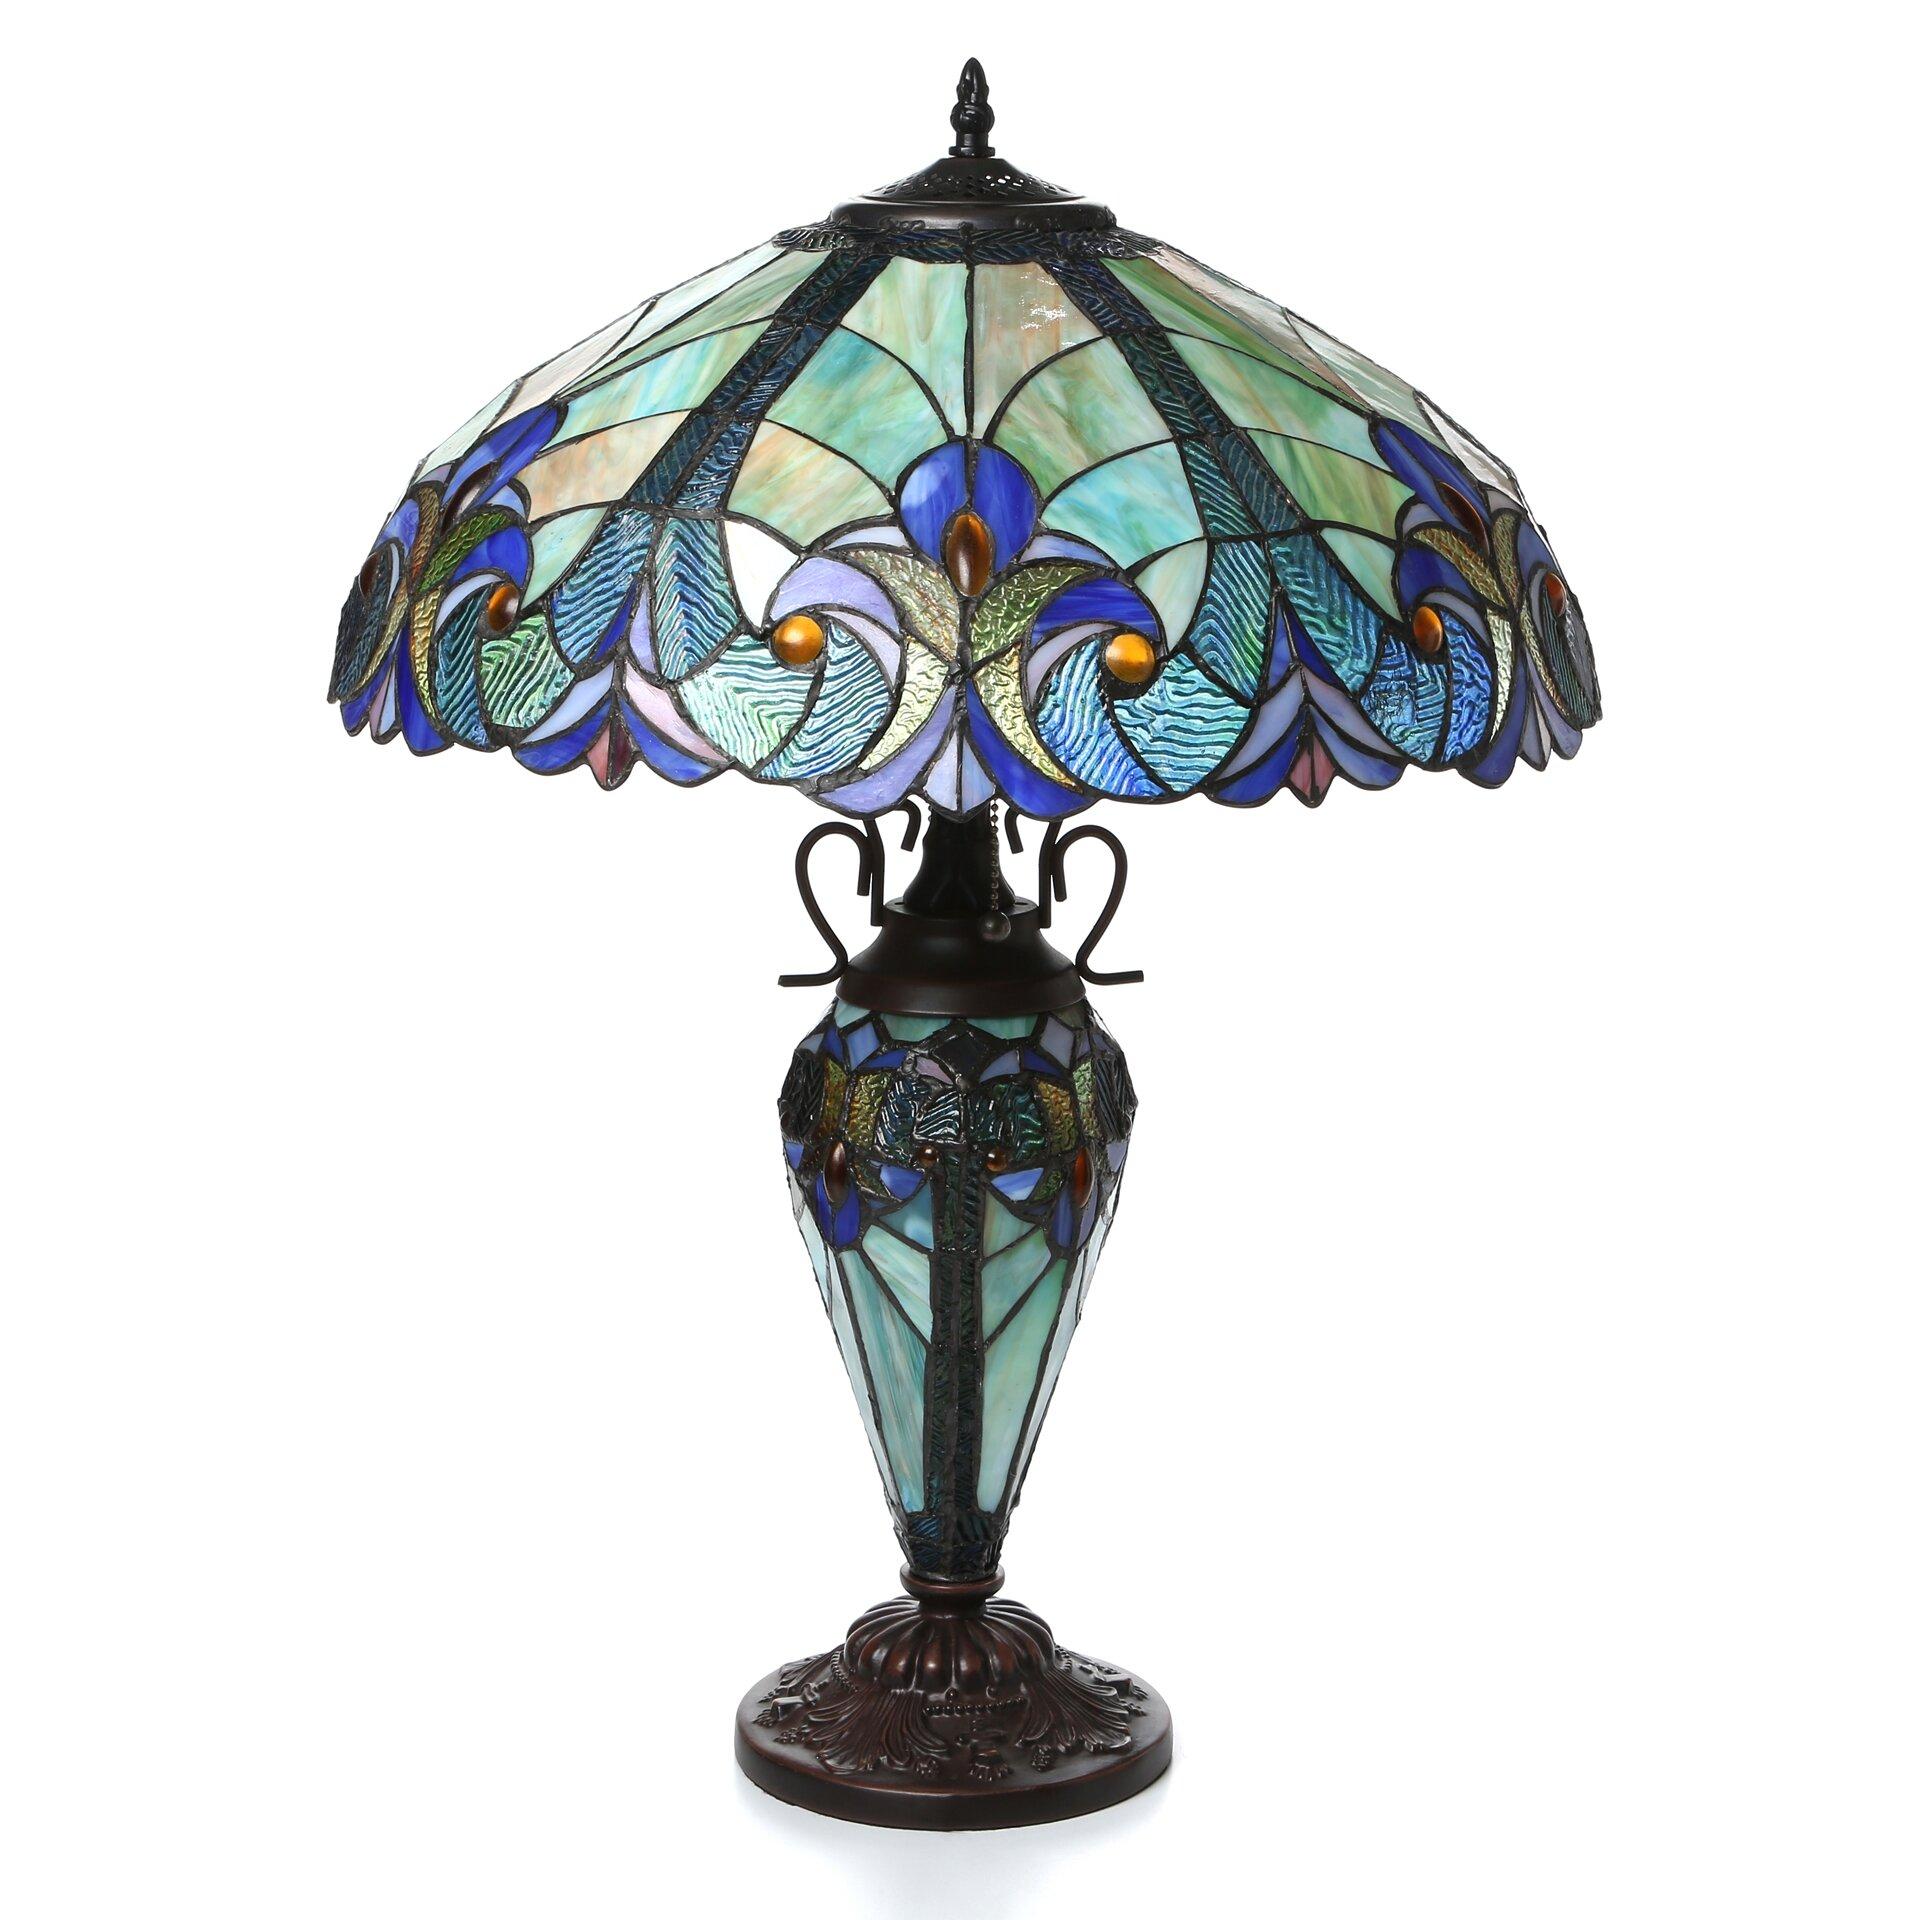 Black Table Lamps Rosalind Wheeler SKU RSWH2005